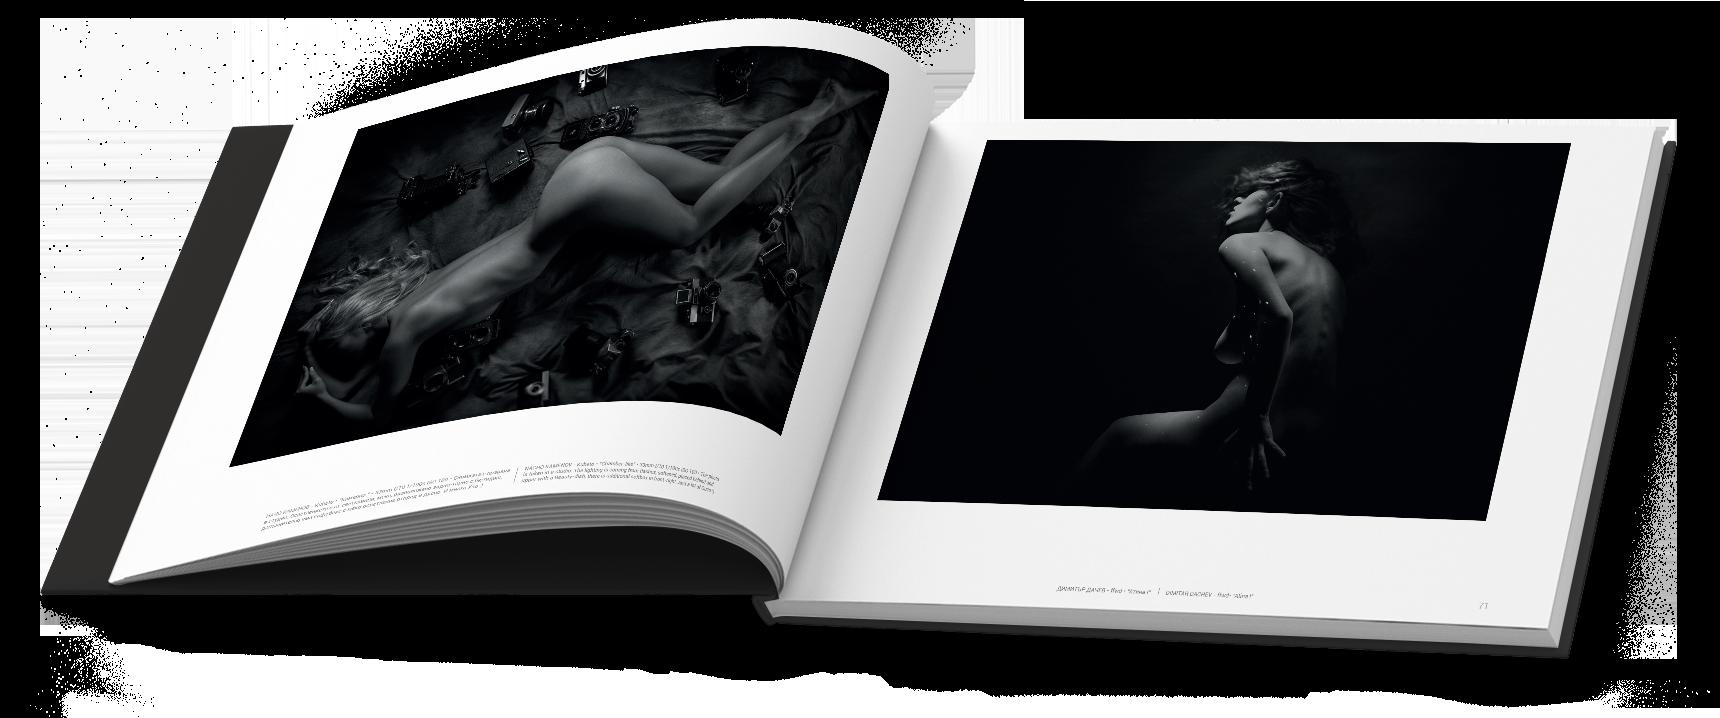 Фотографски Албум 2018 г. - Black&White &Color - страници 70-71